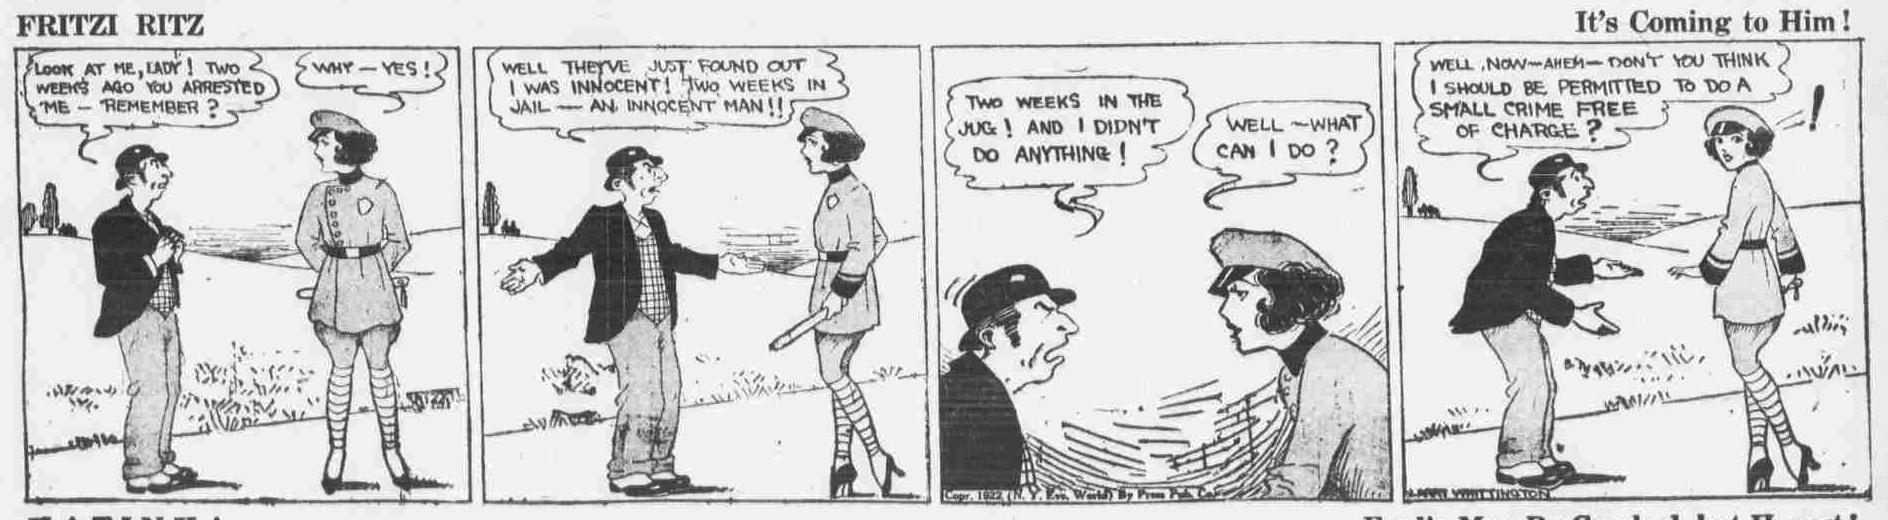 Nov. 17, 1922